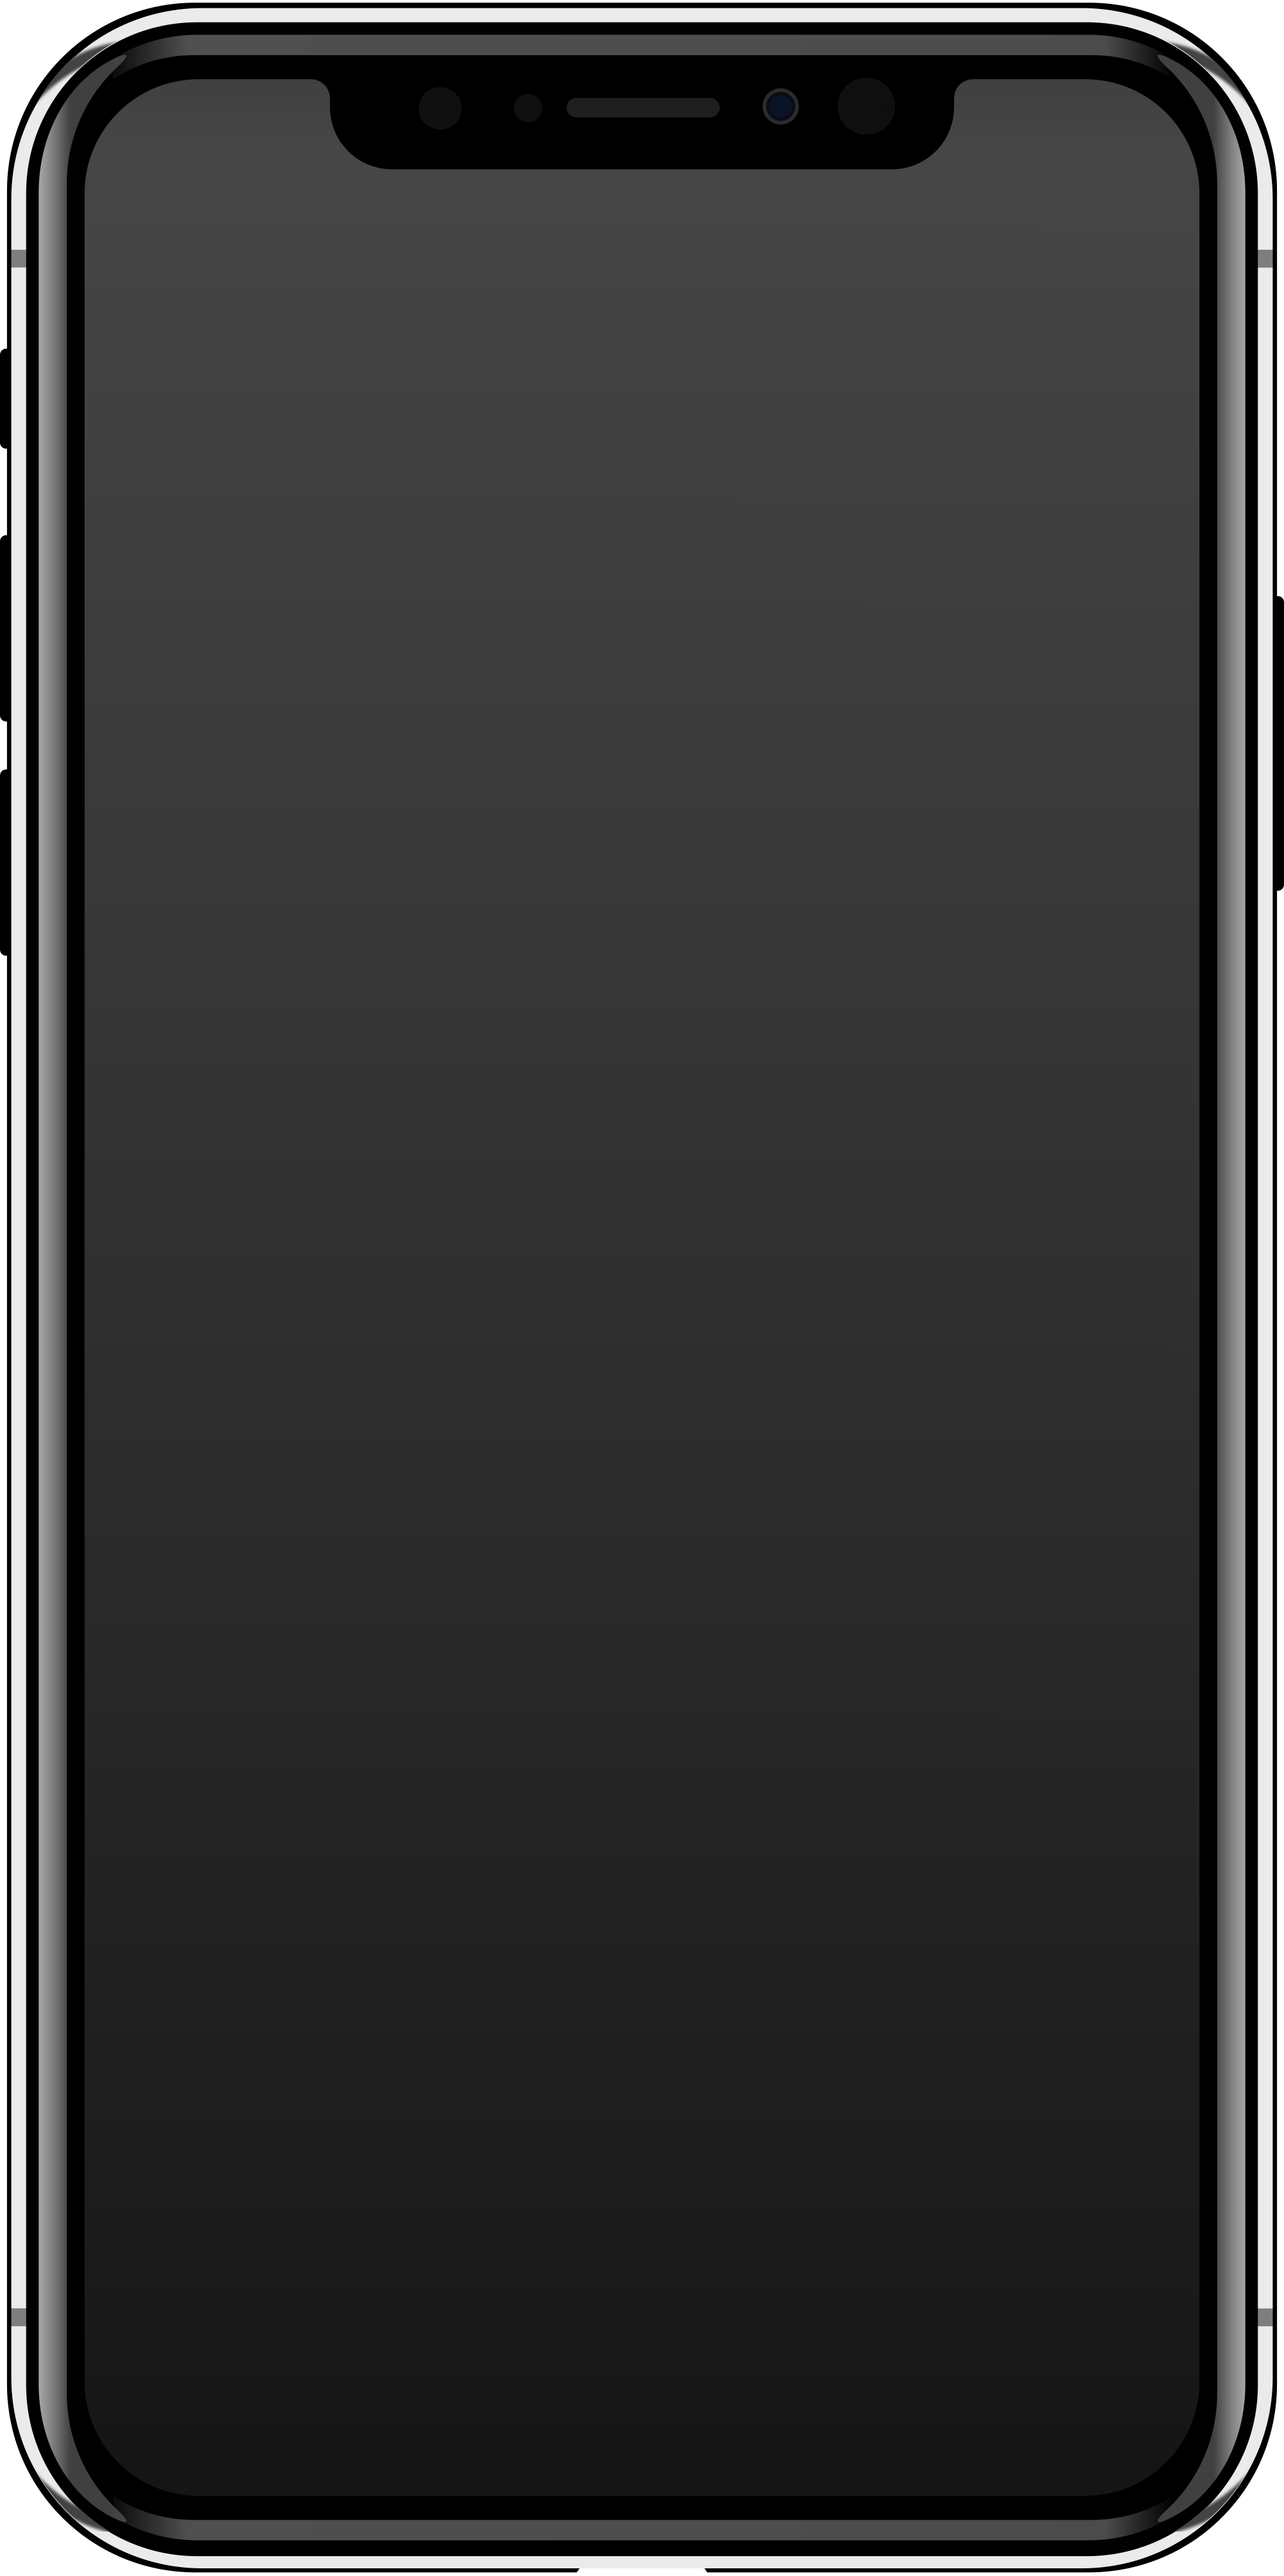 2000x4011 Iphone X